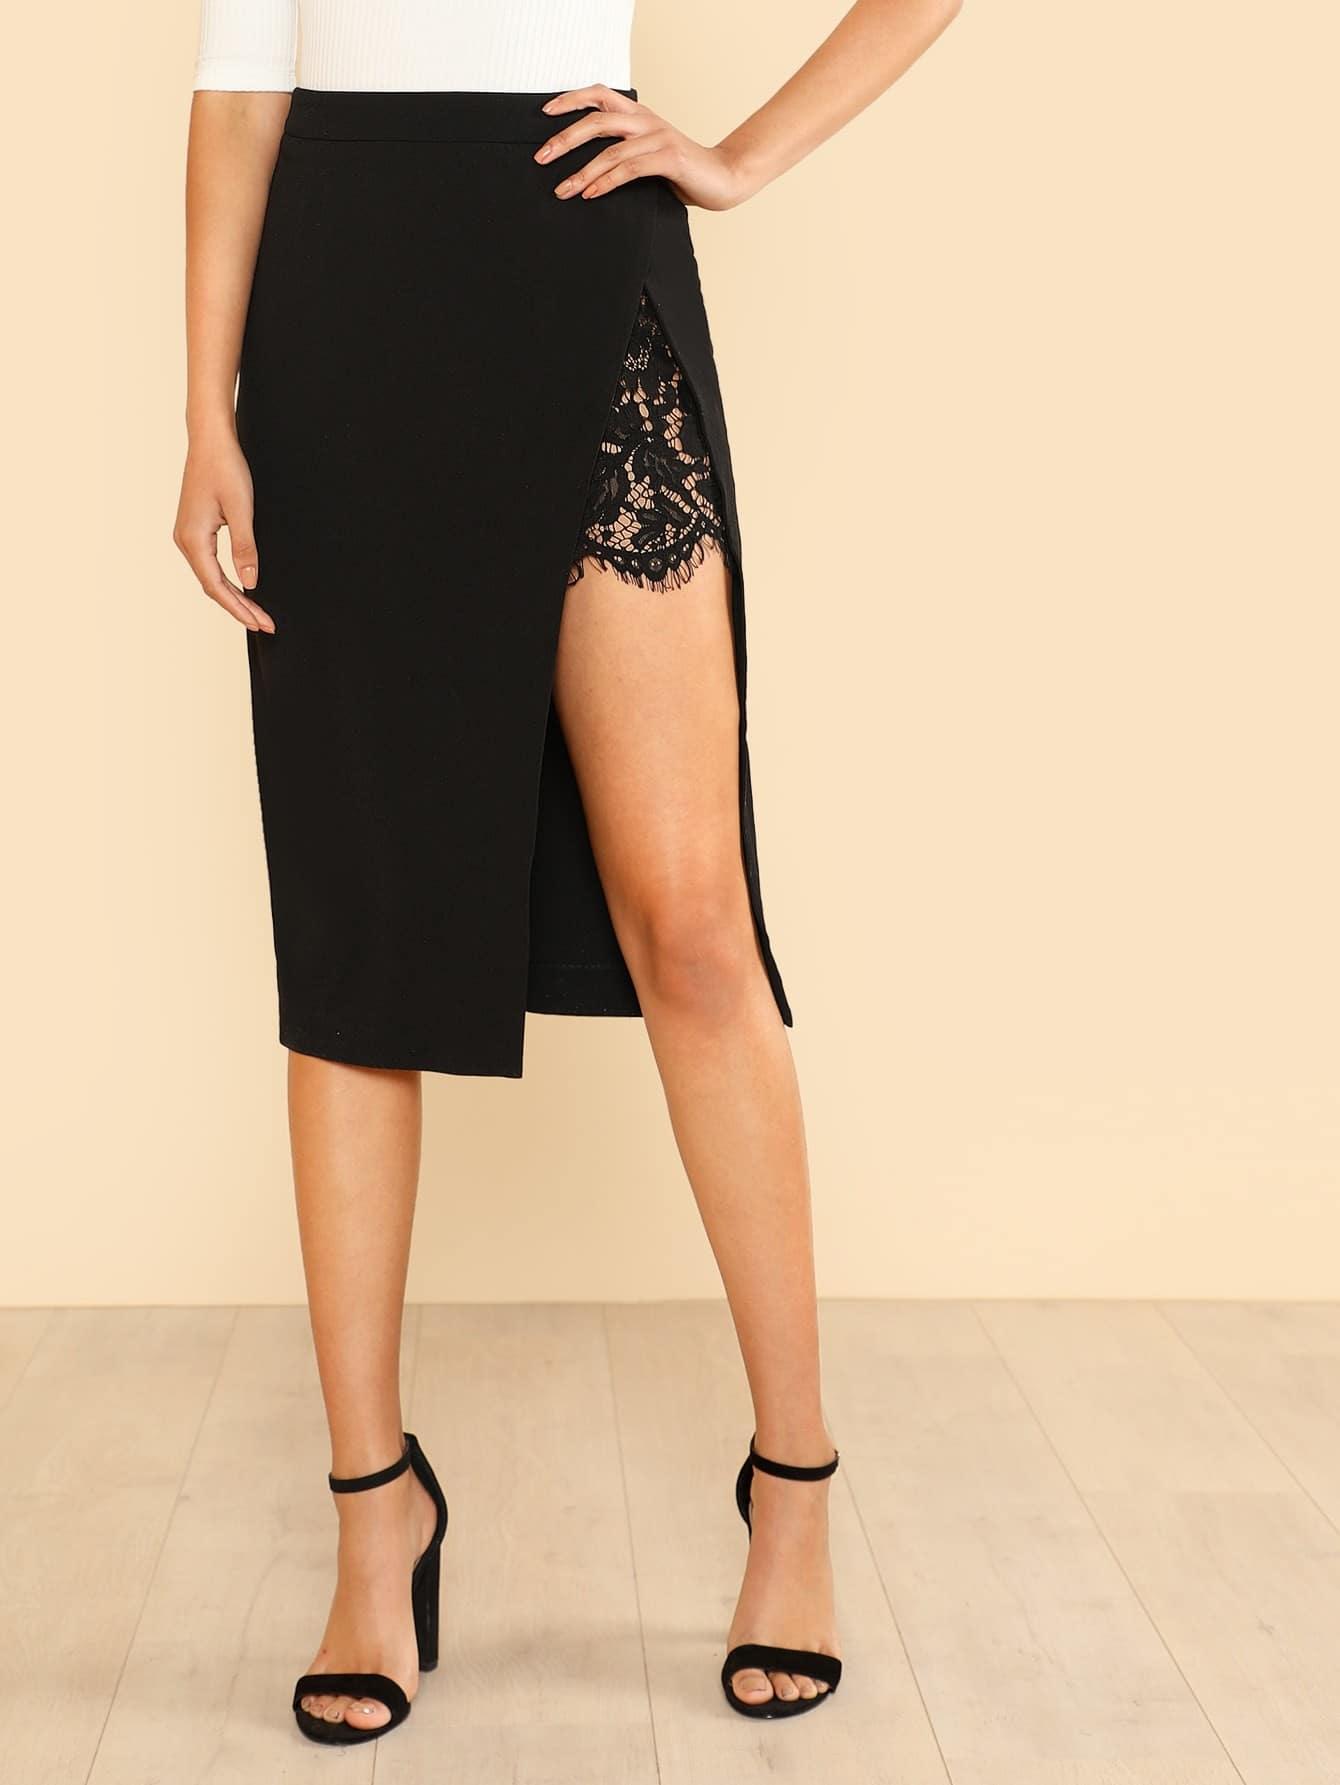 High Slit Lace Underlay Pencil Skirt grommet lace up slit back pencil skirt